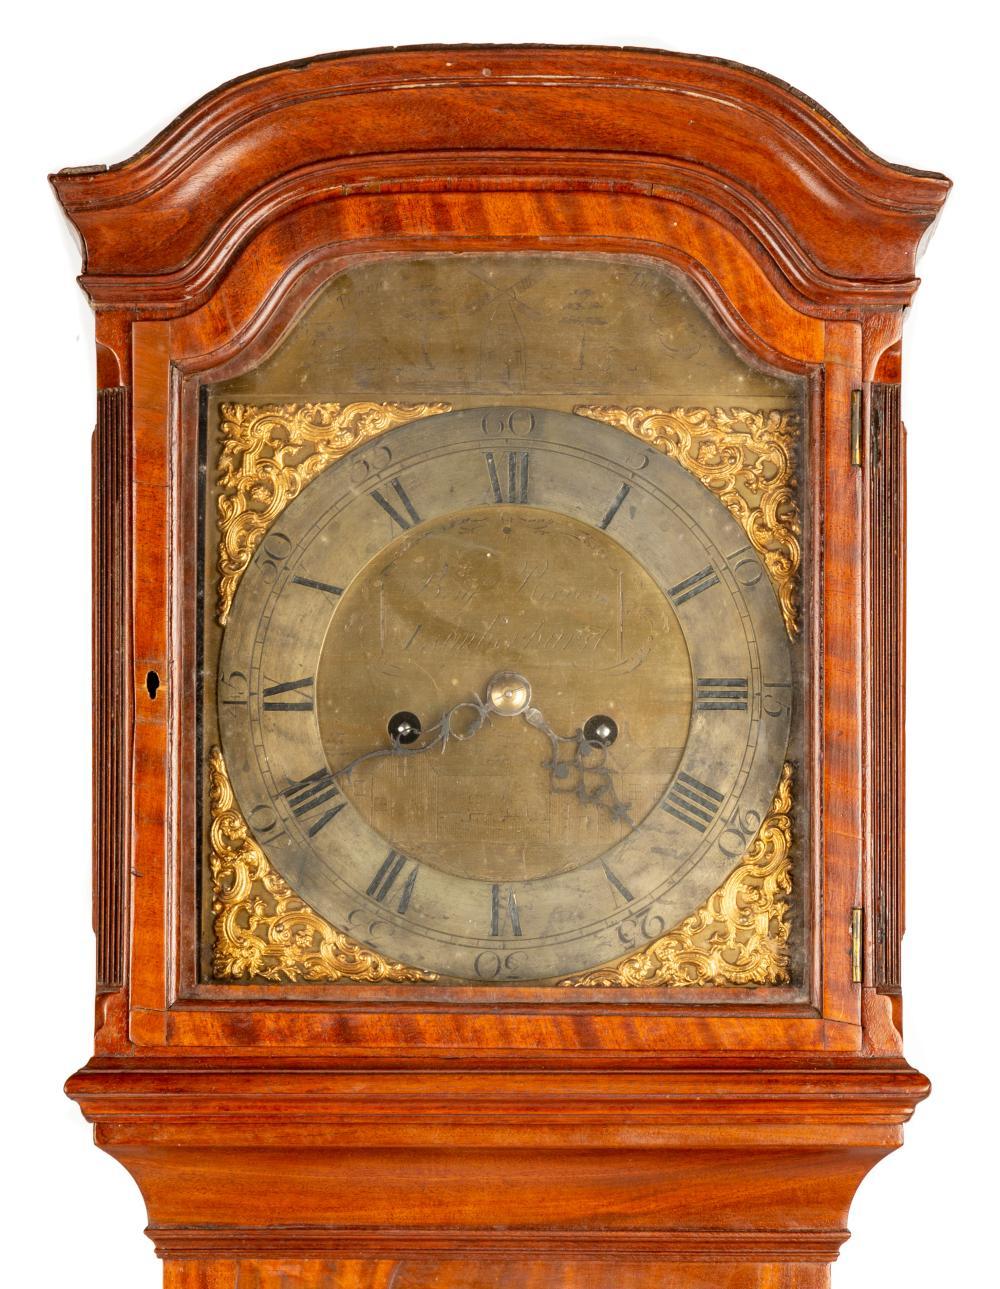 Benjamin Reeves, English Tall Case Clock